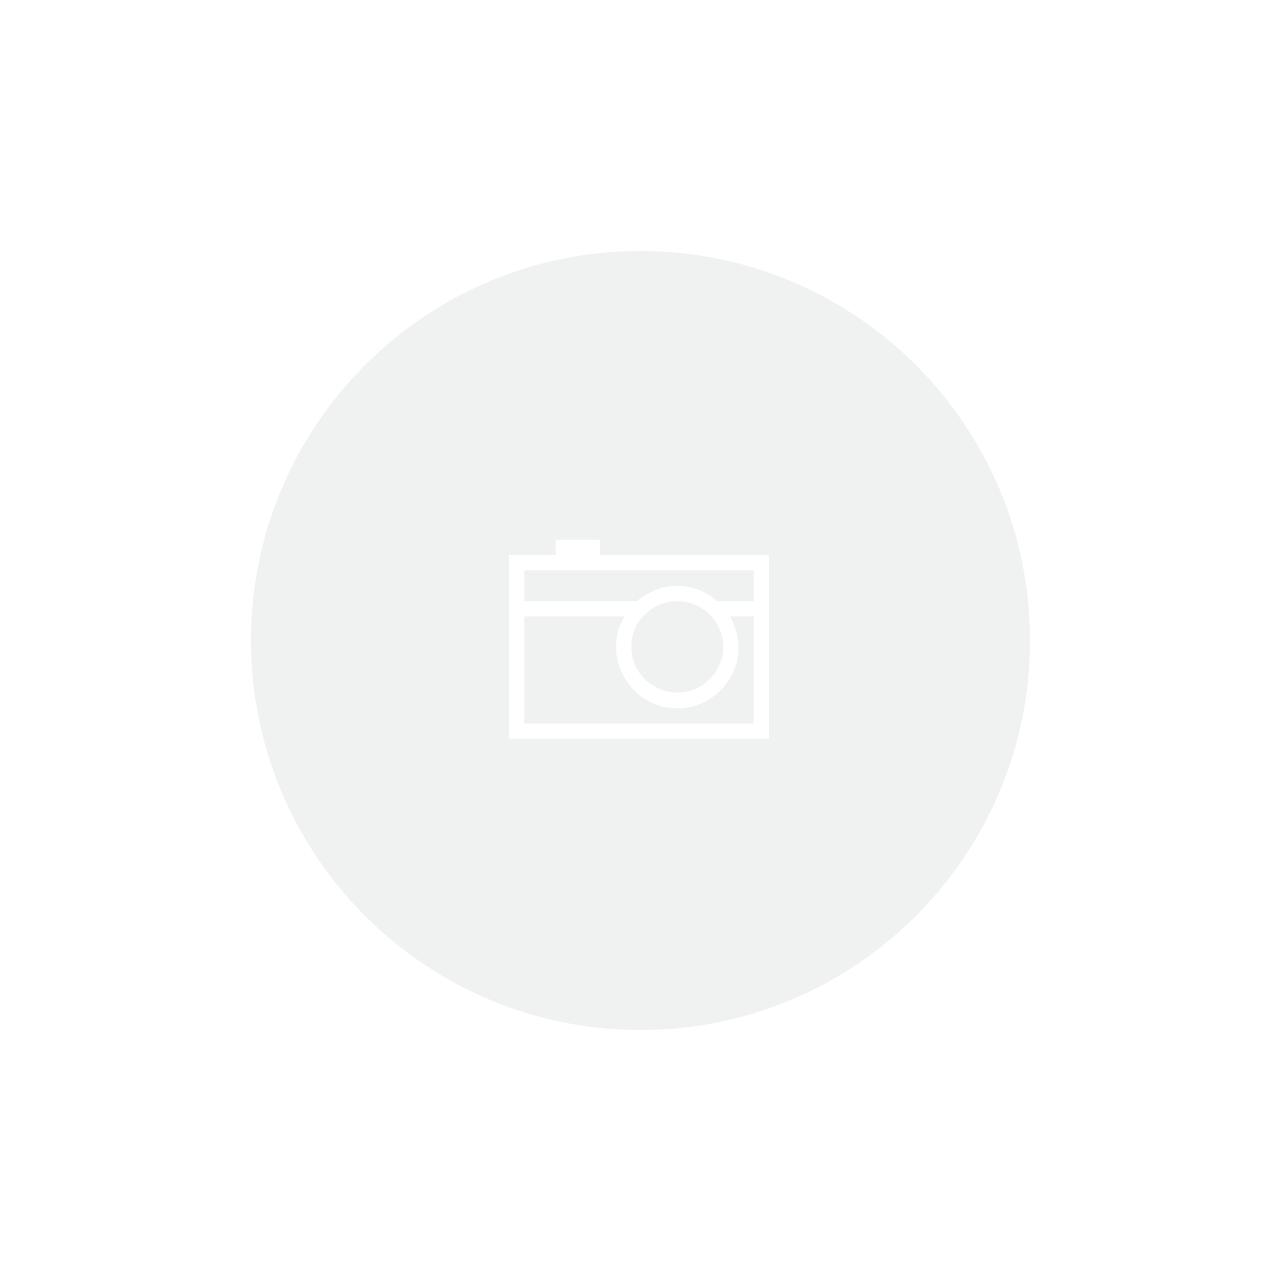 Papel Artesanal Indiano - Ref. 43